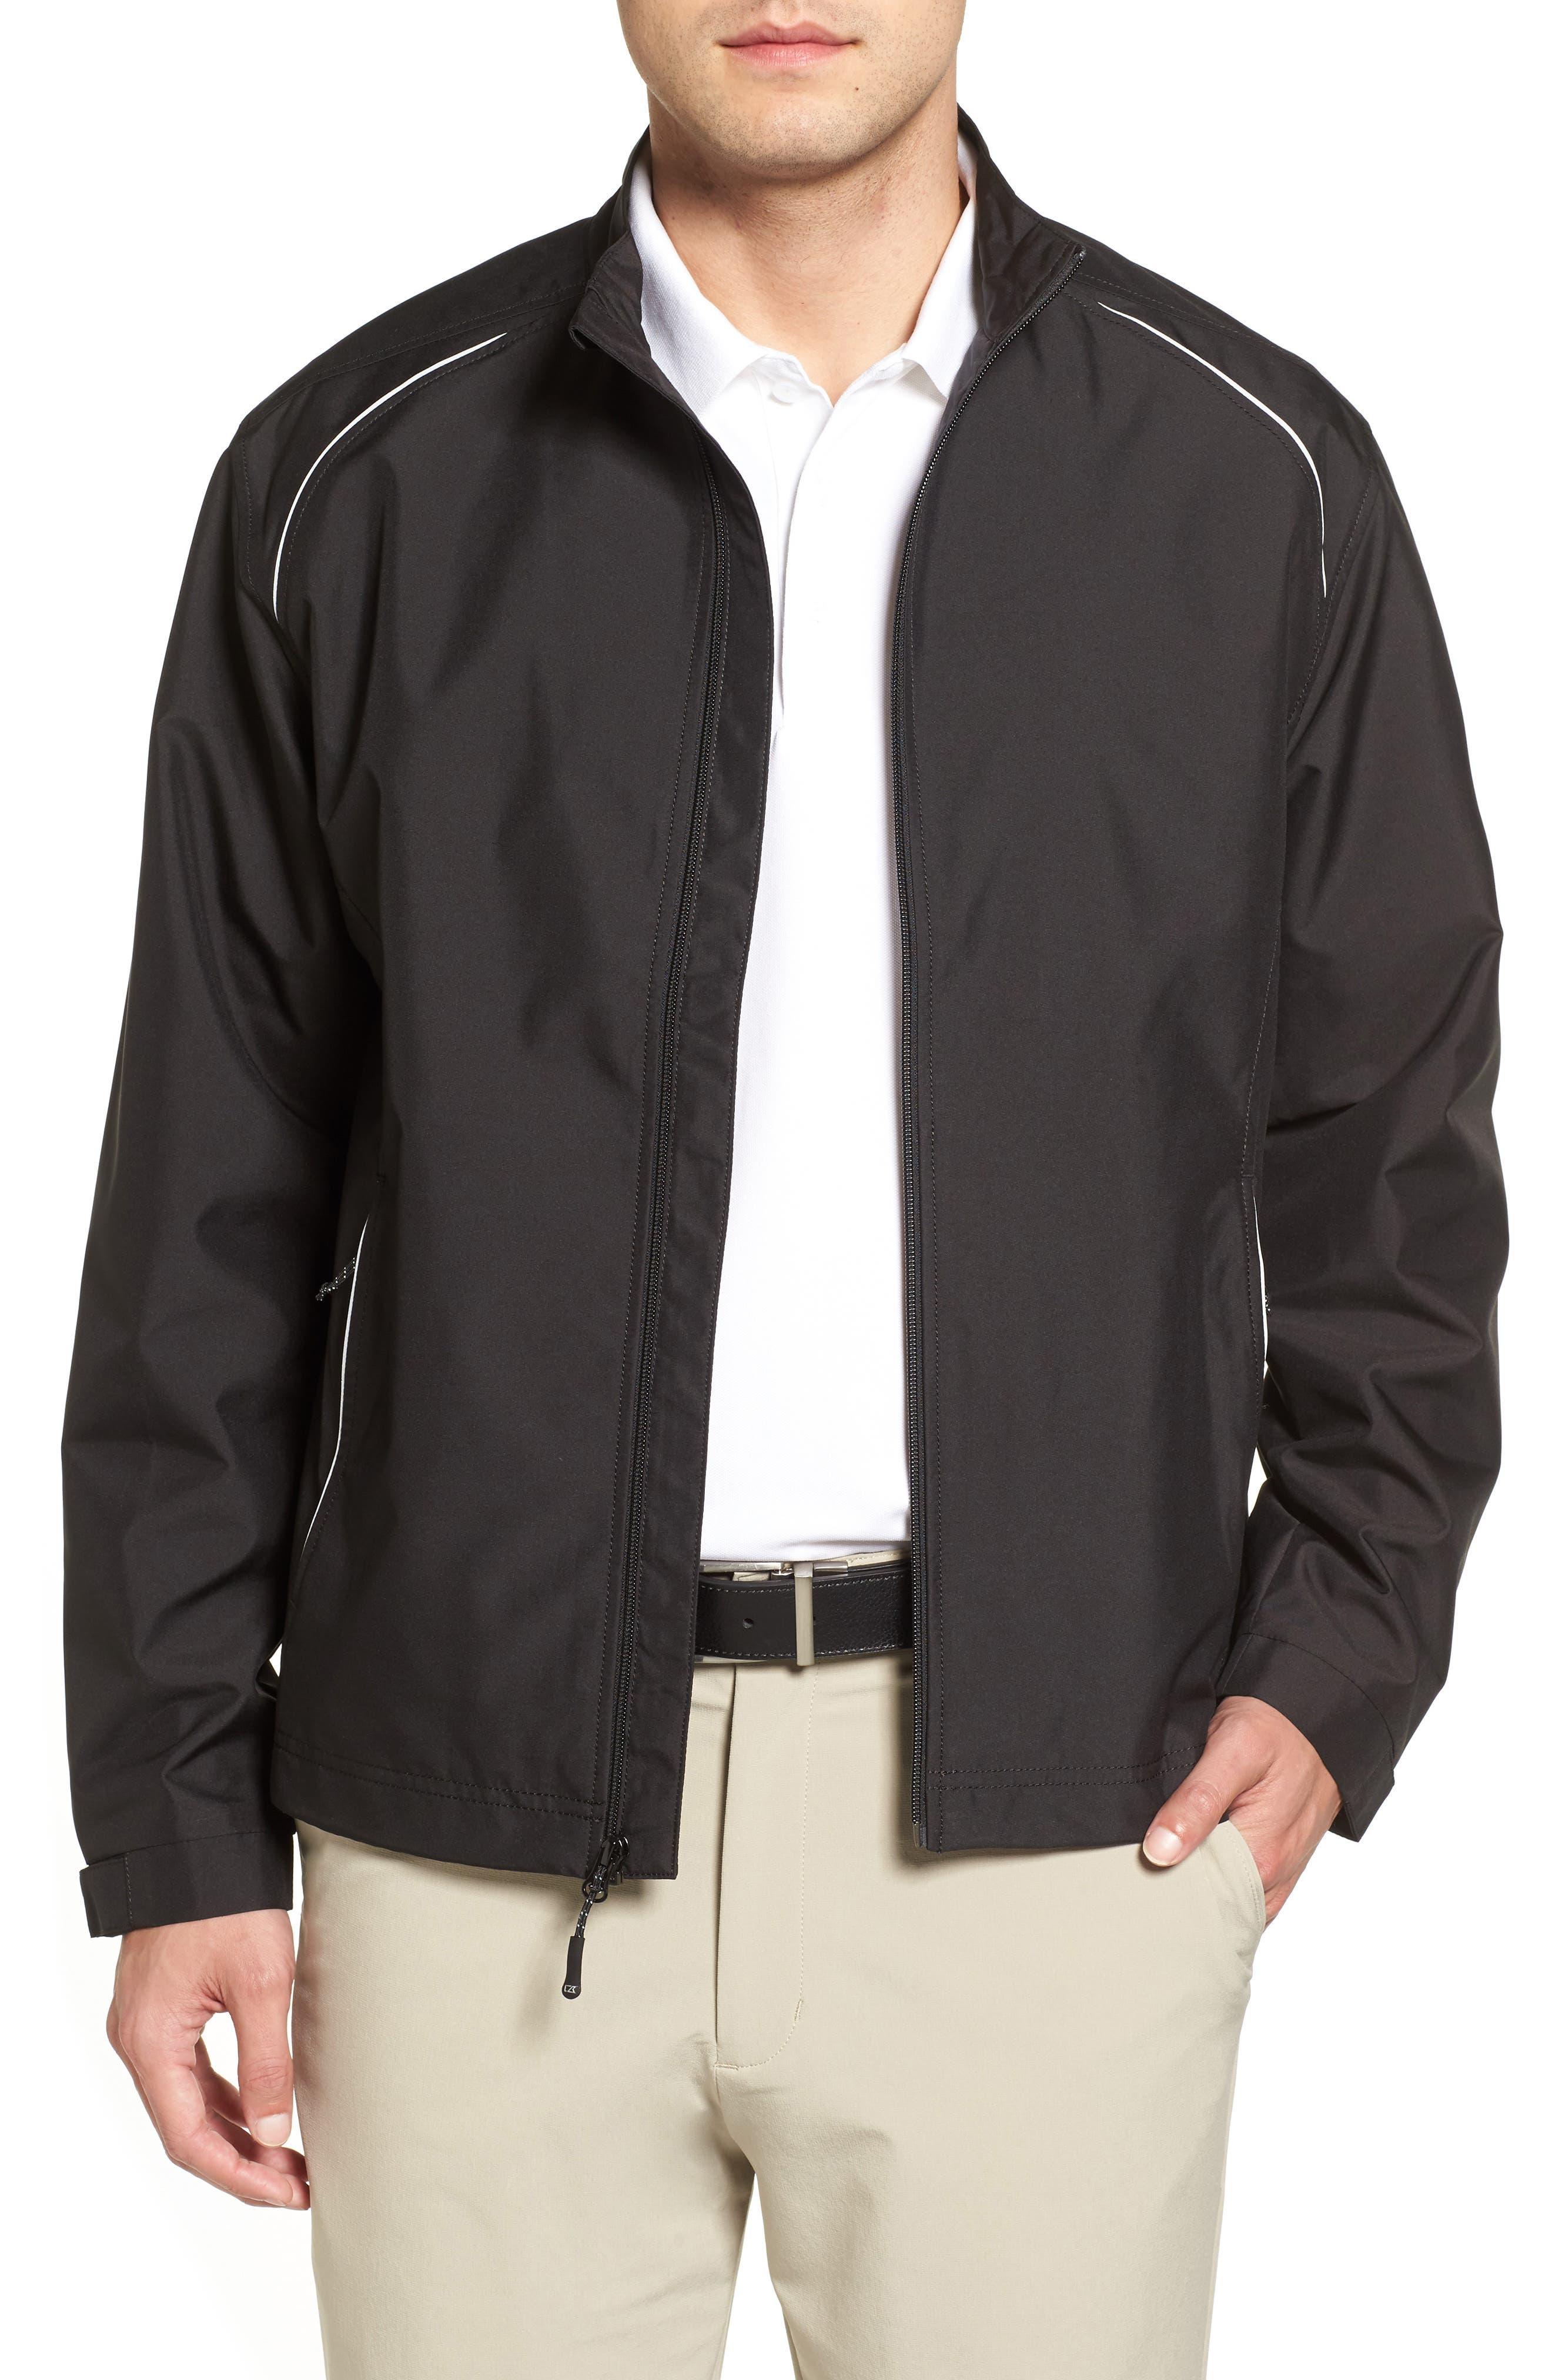 WeatherTec Beacon Water Resistant Jacket,                             Main thumbnail 1, color,                             Black